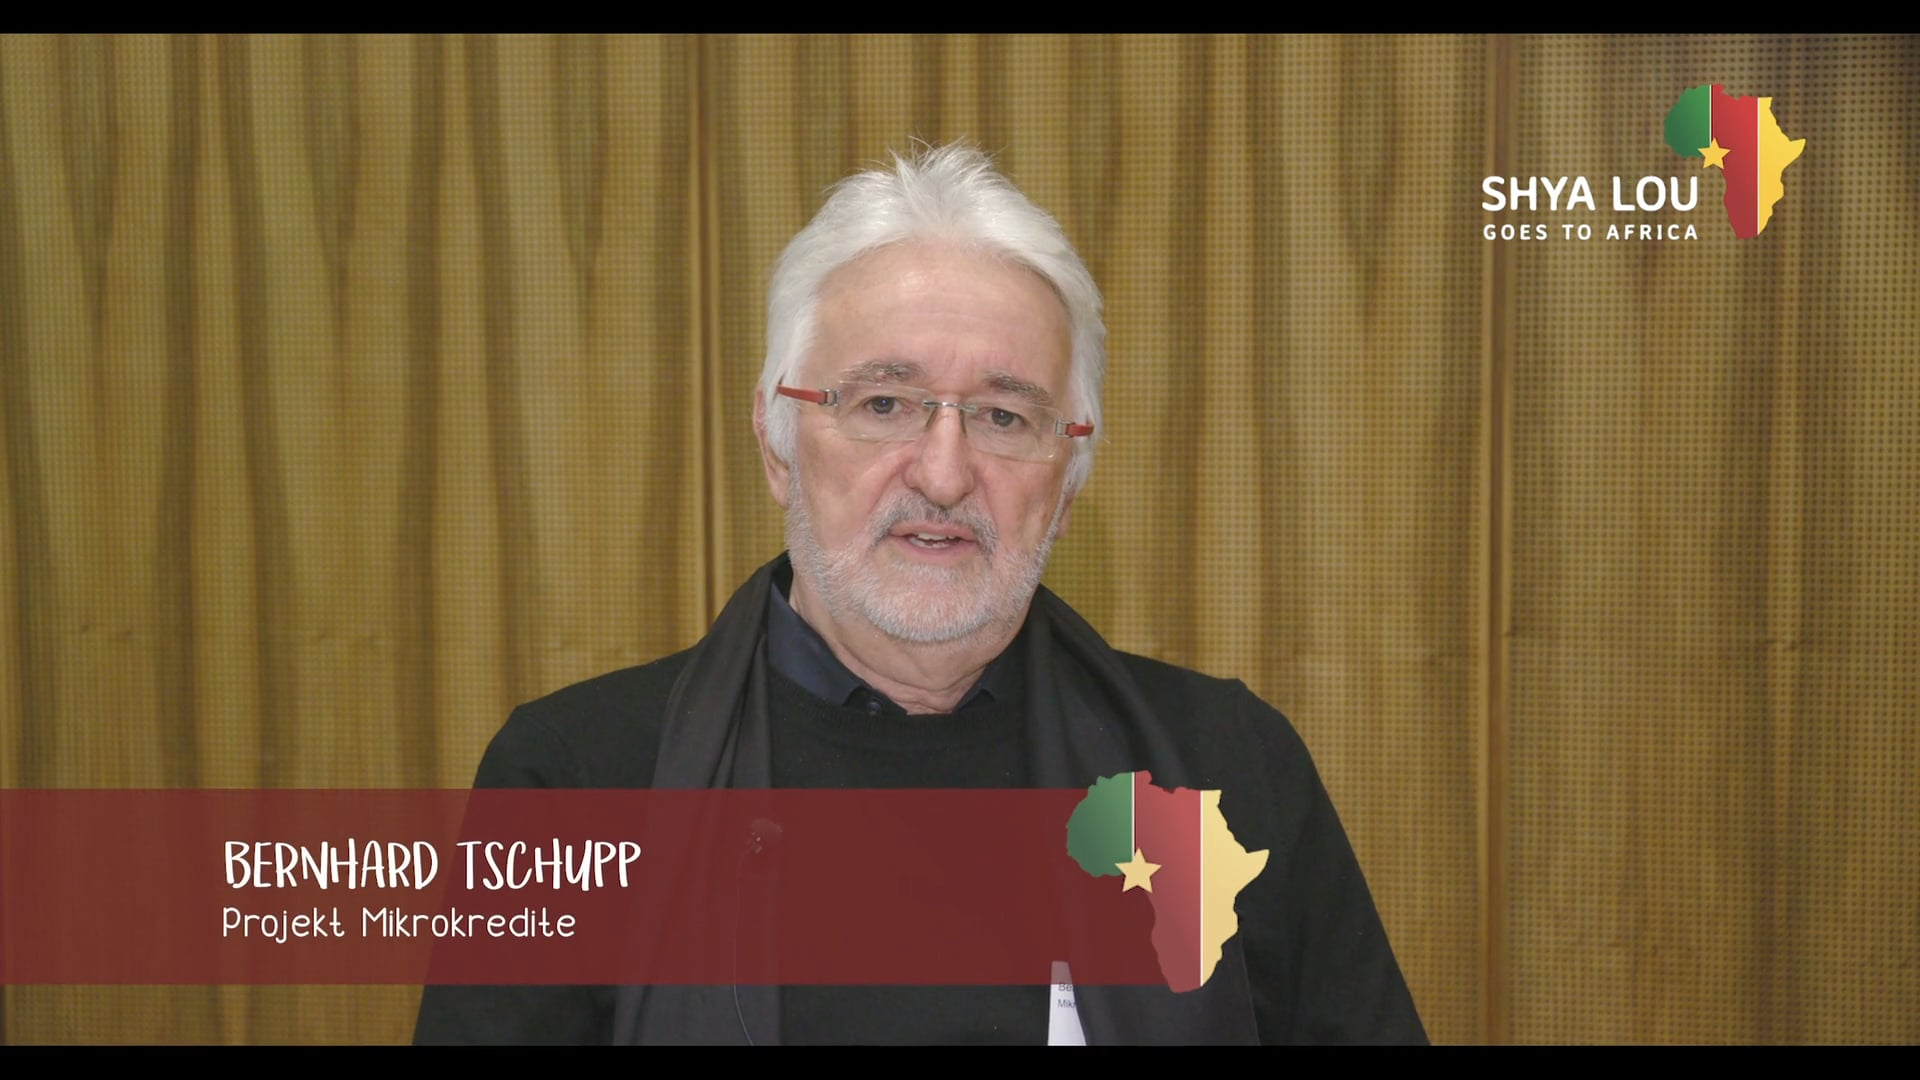 Shya Lou goes to Africa – Testimonial Bernhard Tschupp (fr) – Projet Microcrédite